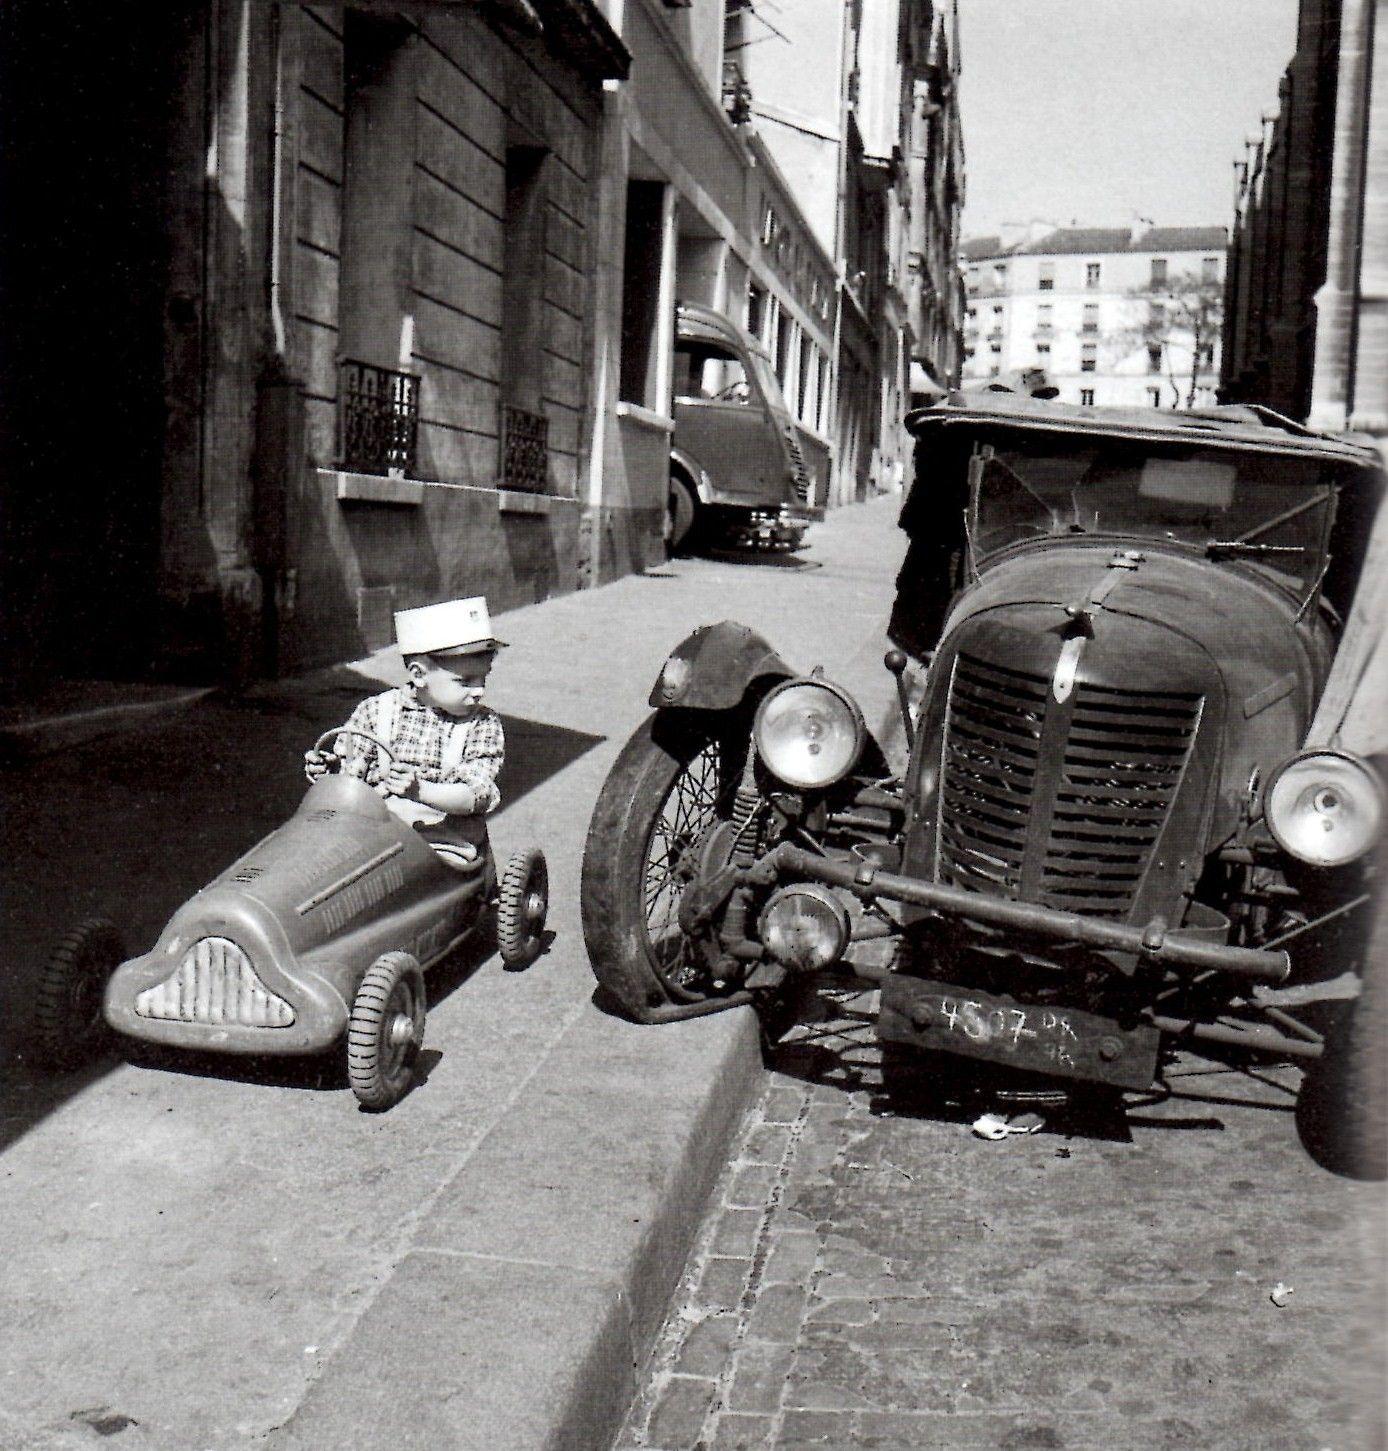 anthony luke's not-just-another-photoblog Blog: Photographer Profile ~ Robert Doisneau